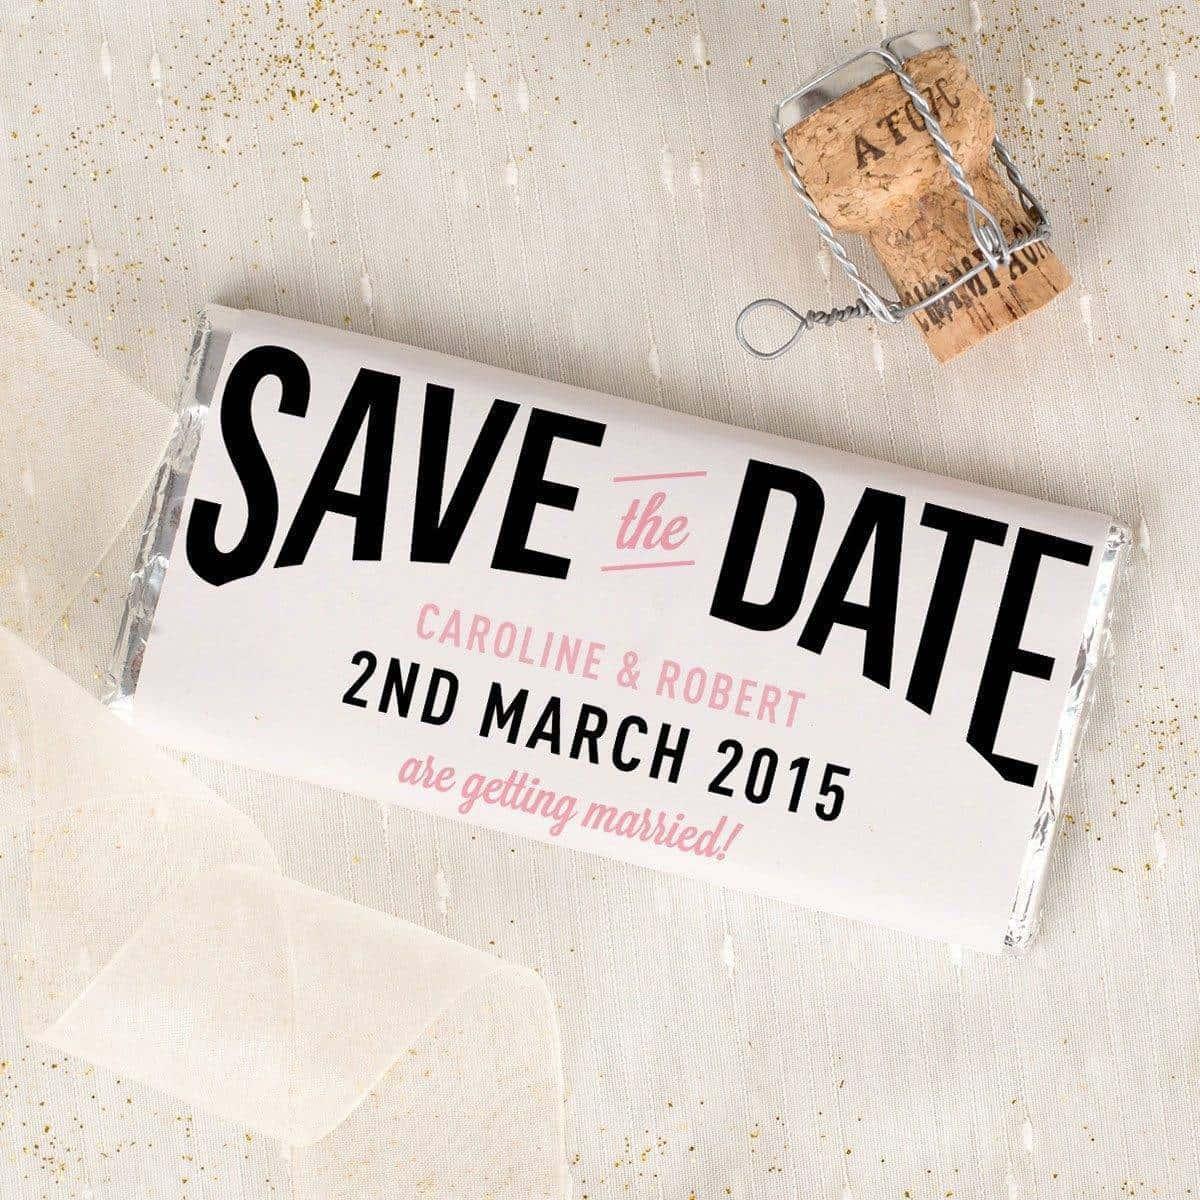 Sensational Save the Dates